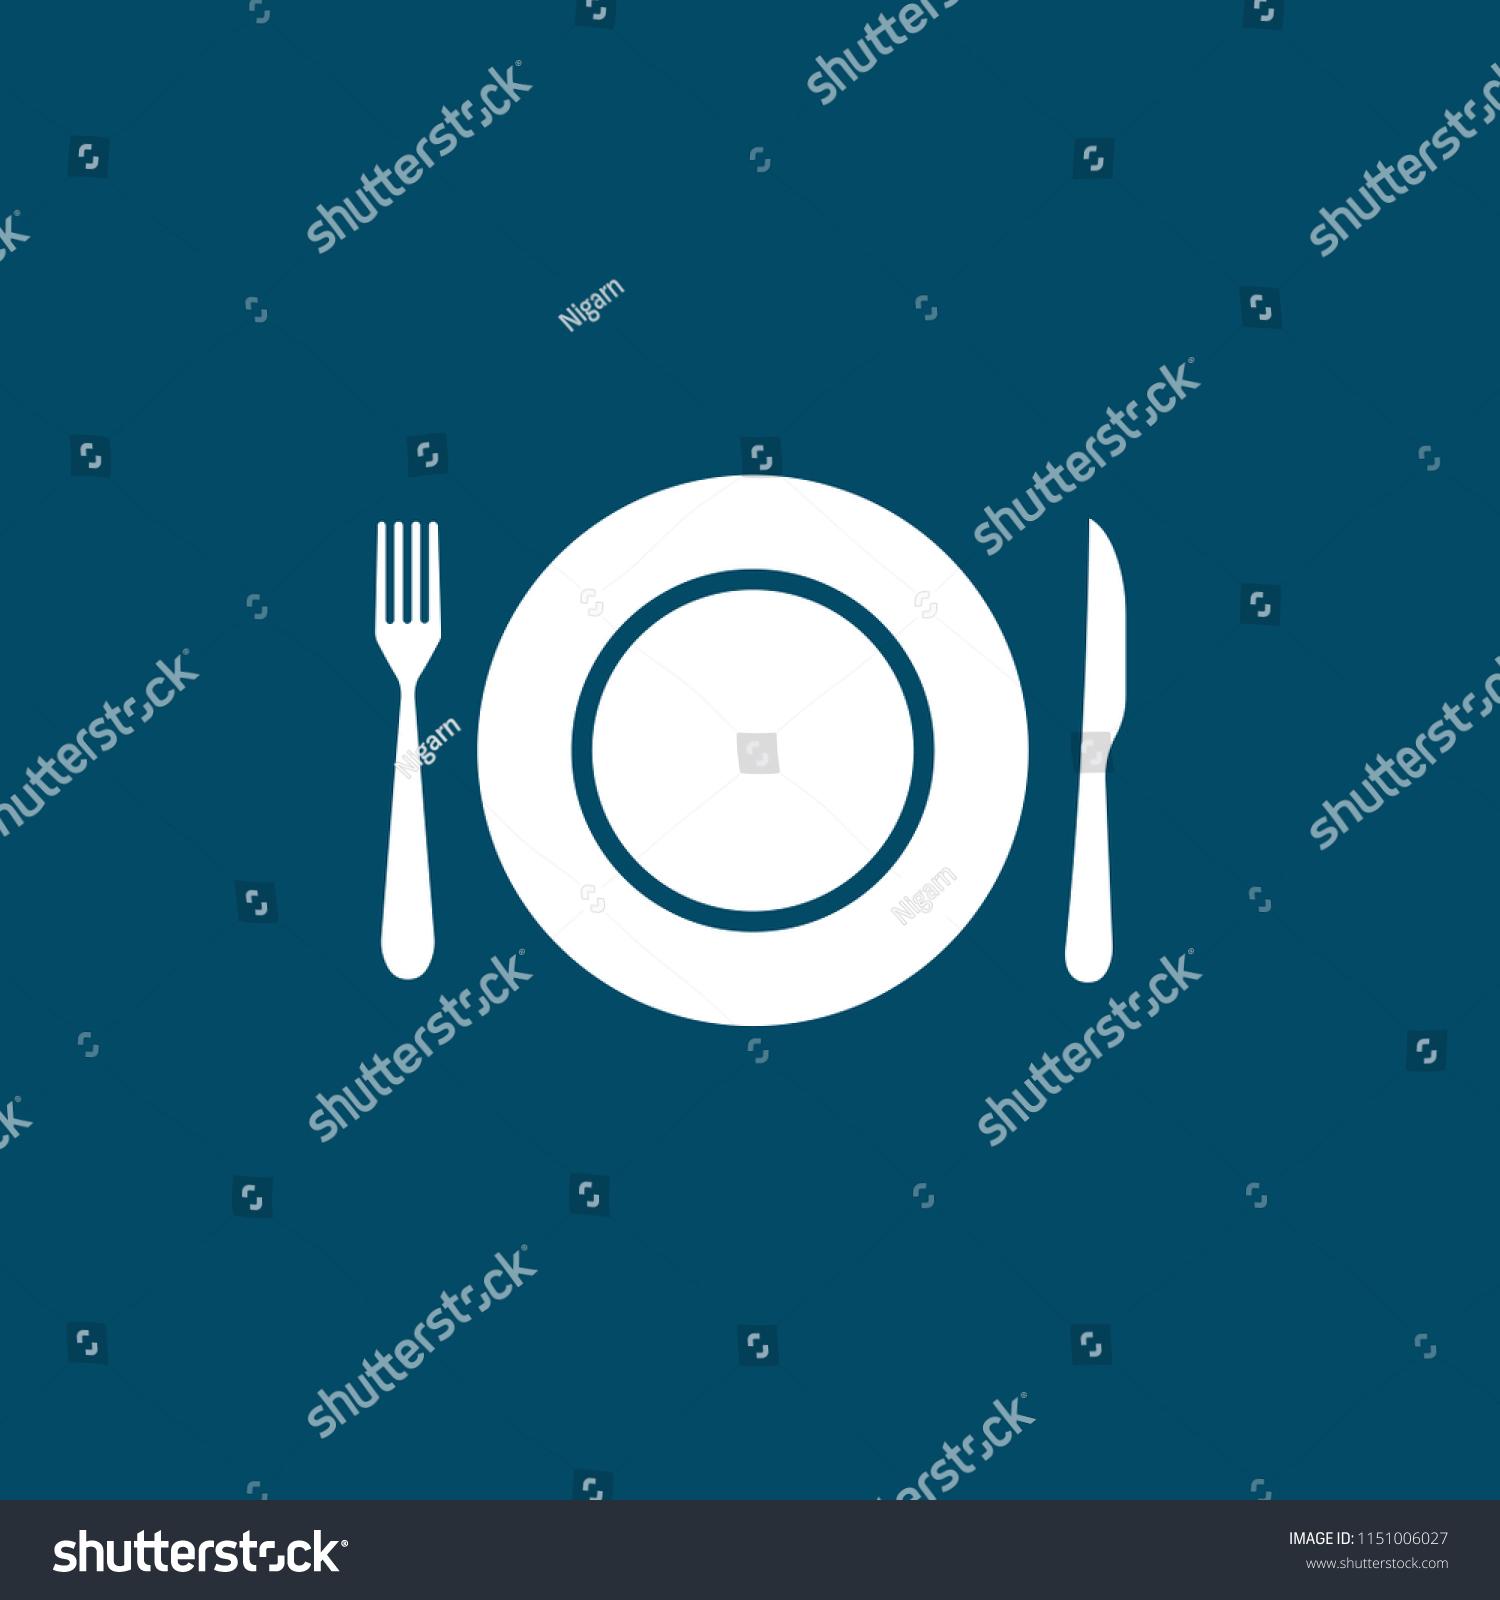 Knifeforkplate Vector Icondinner Mealfoodkitchenlunchutensileat ...